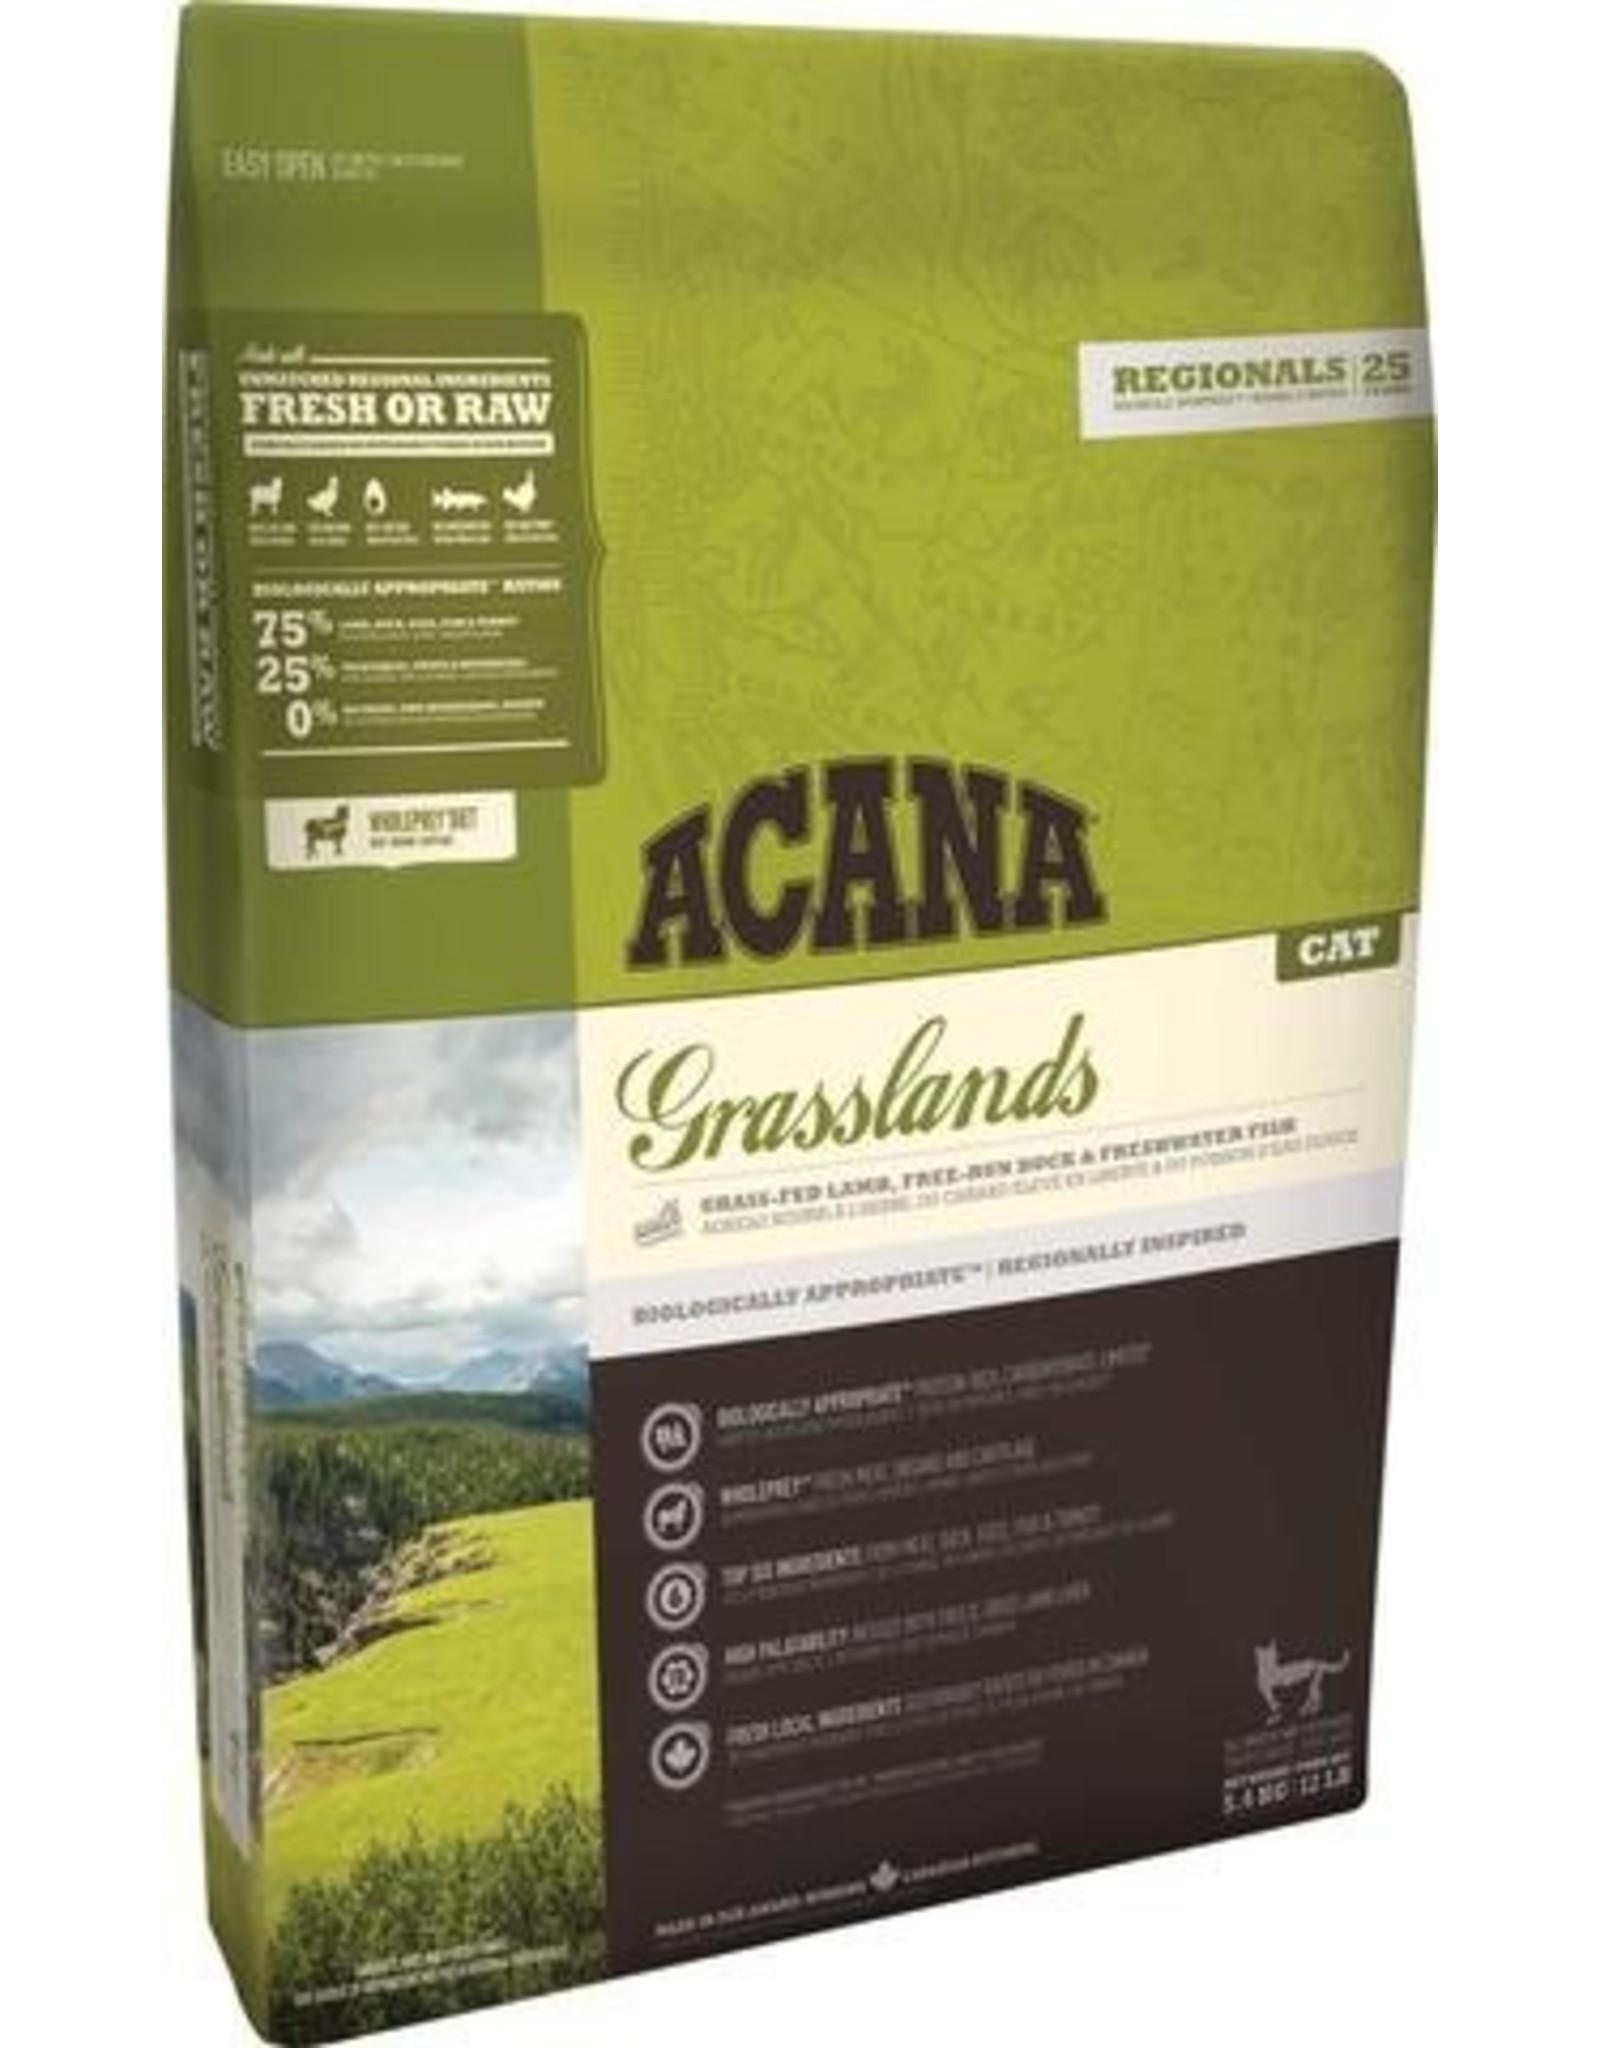 ACANA ACANA Cat Grasslands 1.8kg